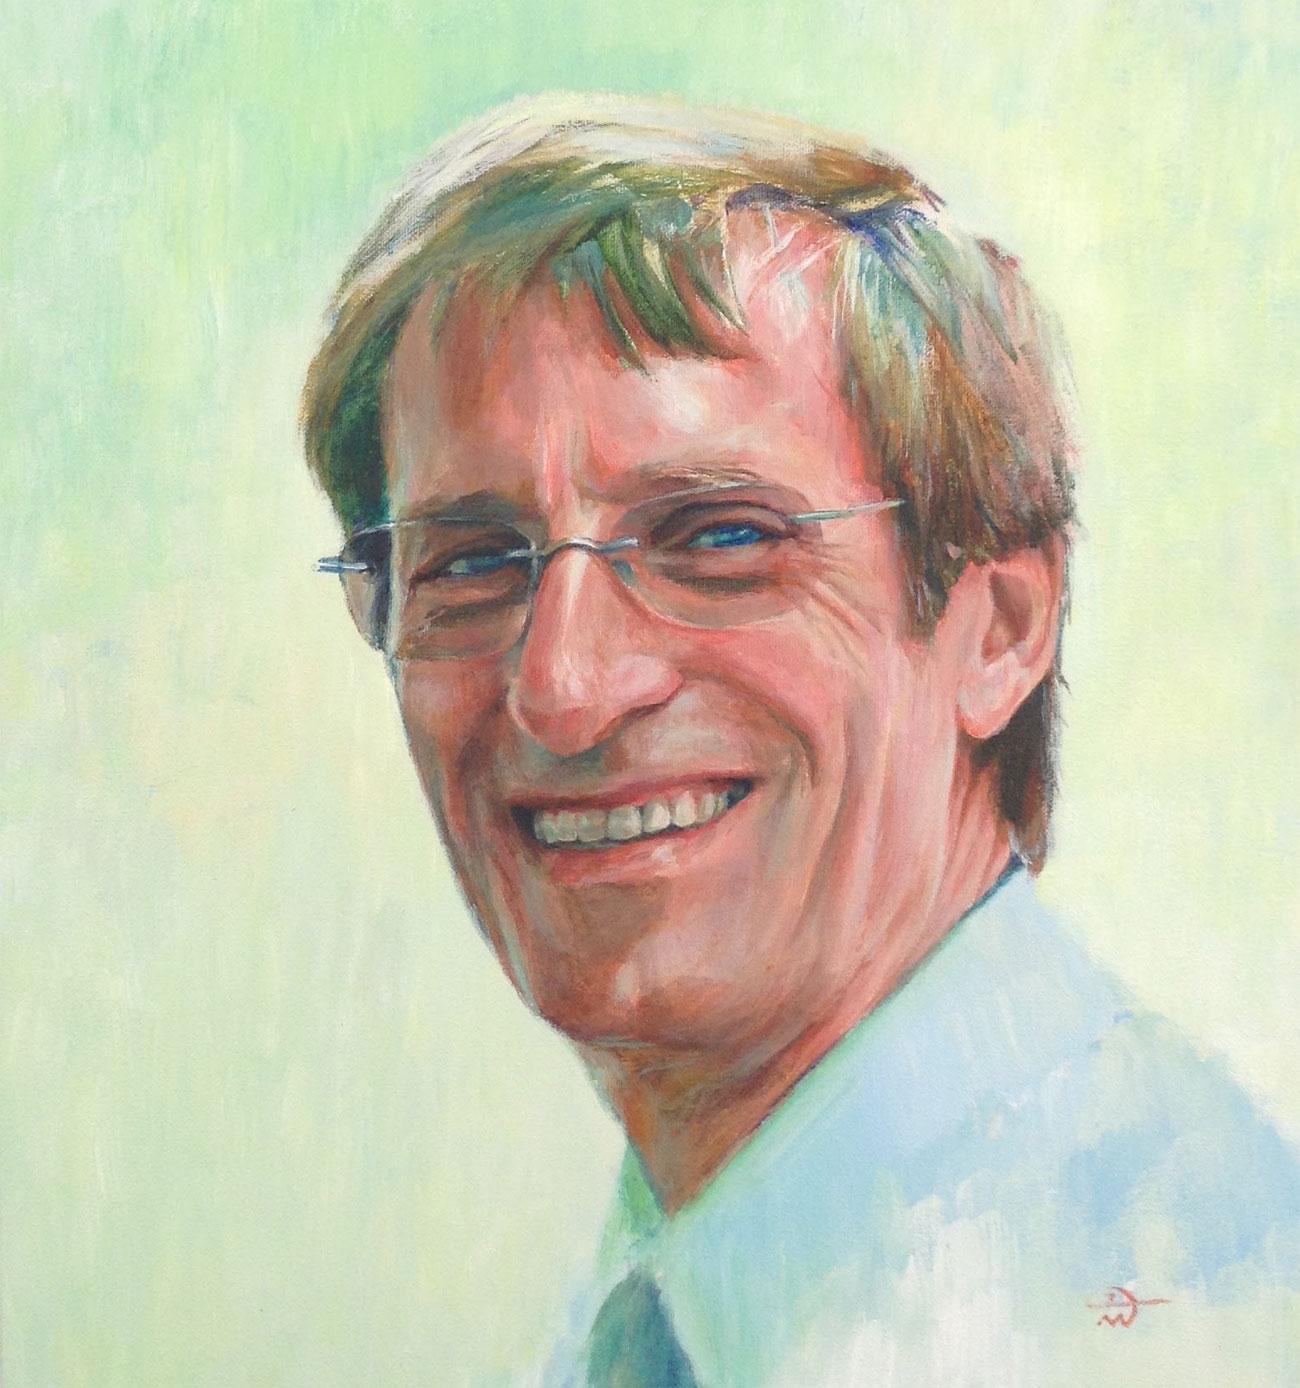 Portrait of Roger Eve. Portrait commission by artist Marina Kim